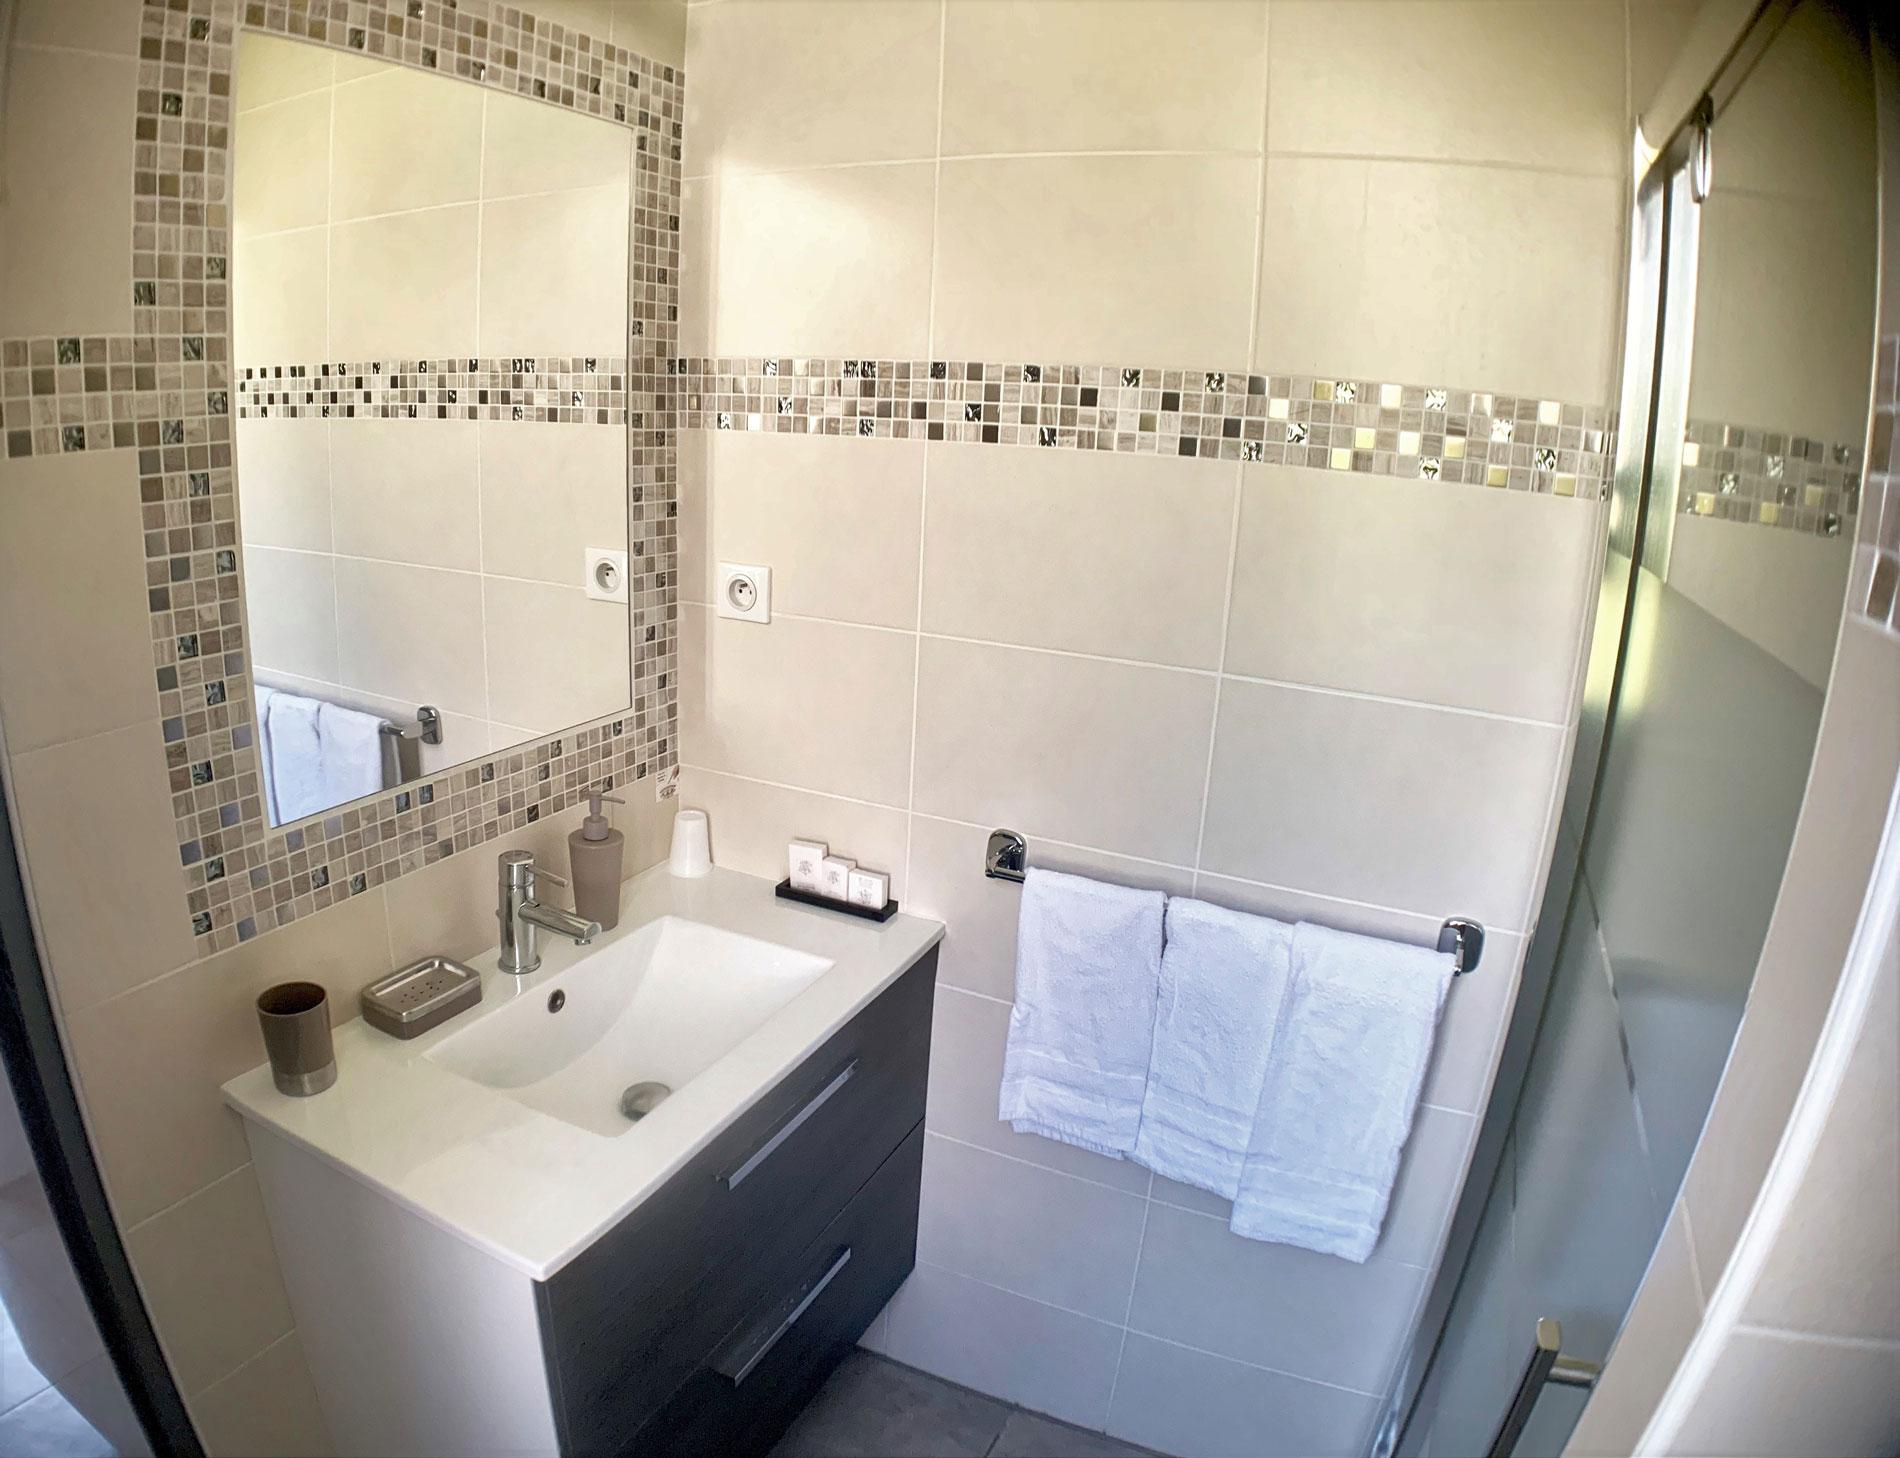 https://www.villaetoile-cannes.com/wp-content/uploads/2019/06/5-lavabo.jpg